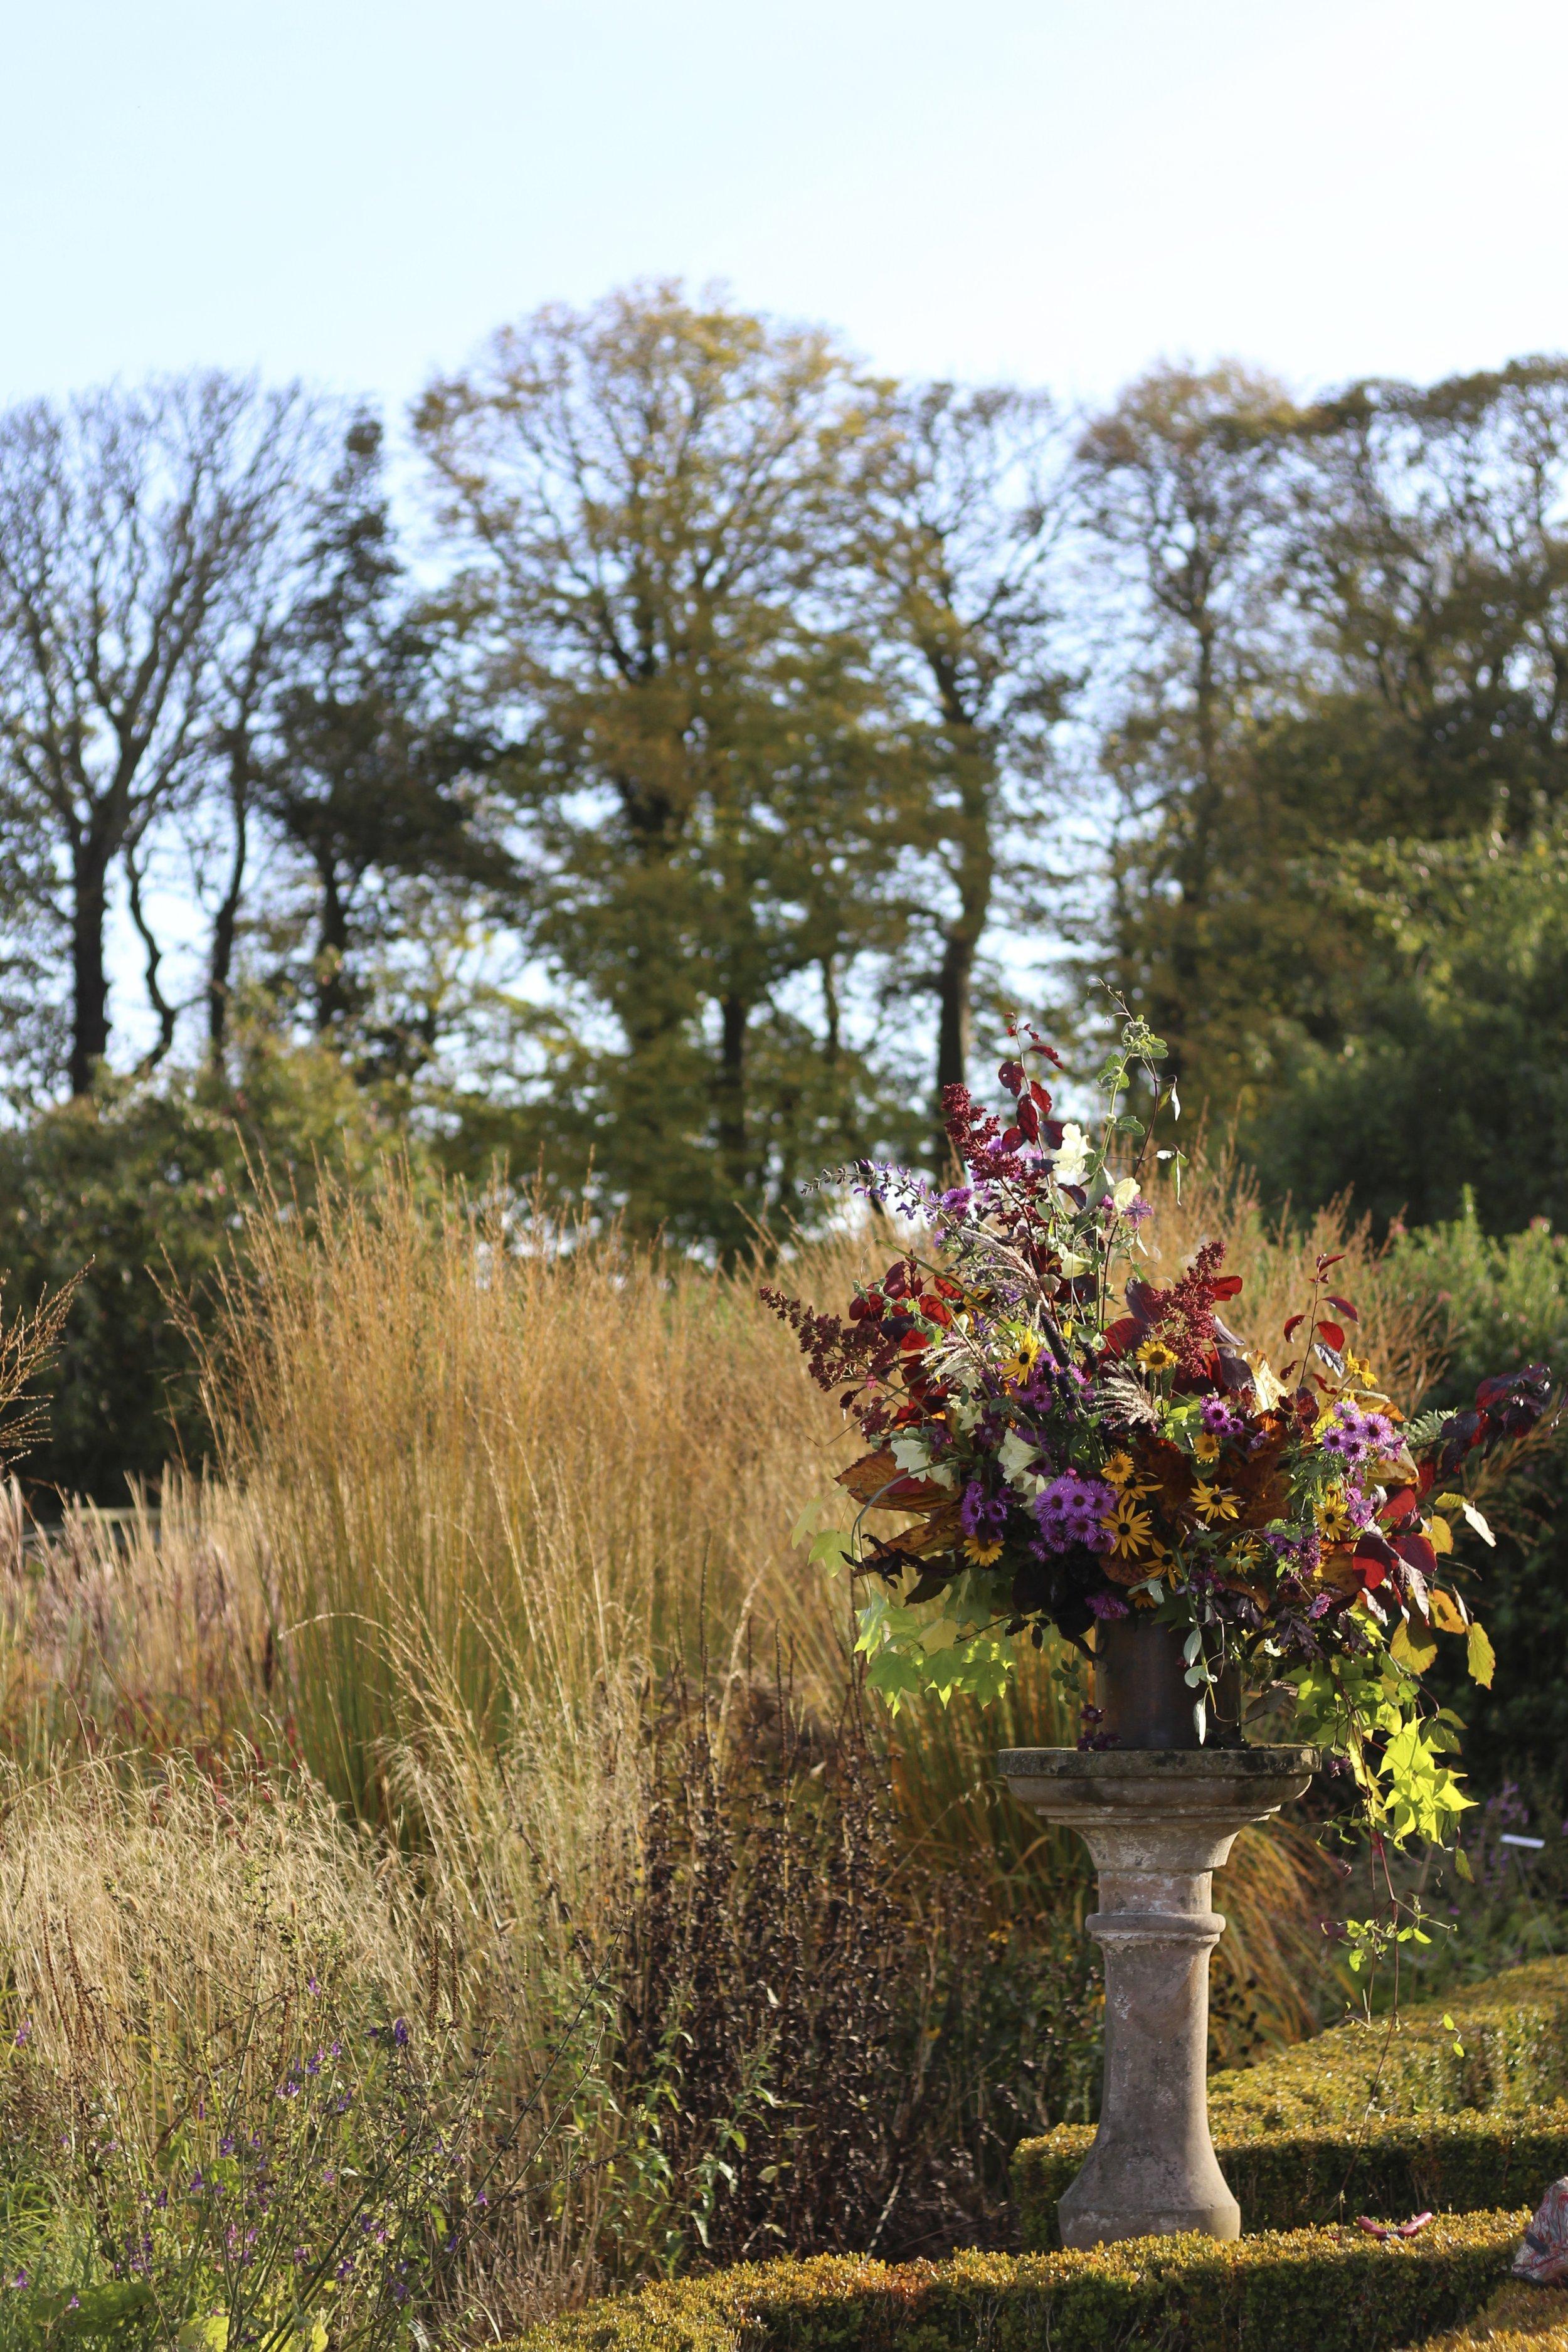 The walled garden's perennials assembled in a copper pot, late October, 2016.